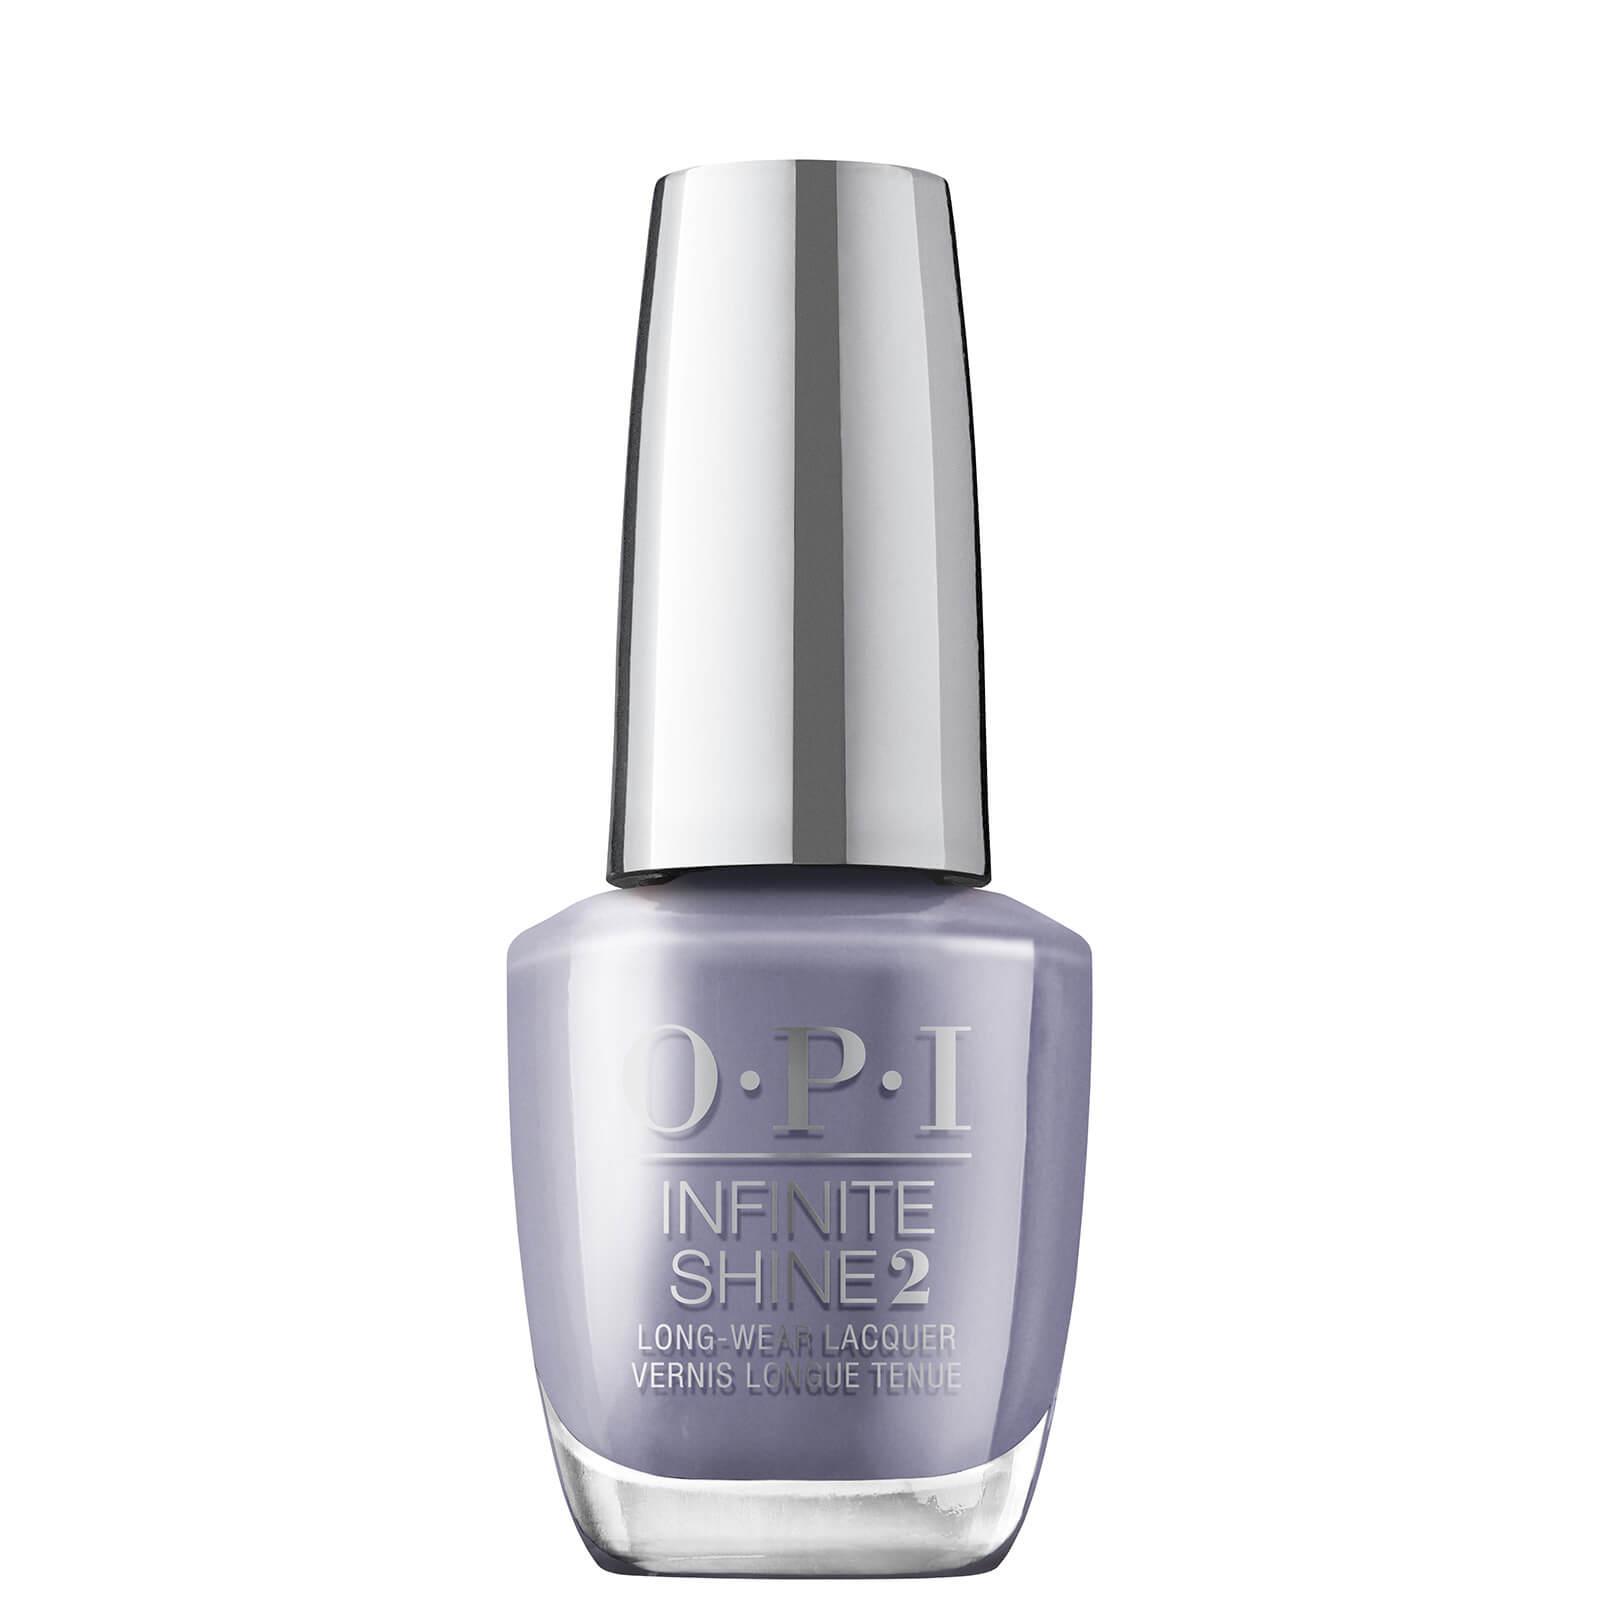 Купить OPI DTLA Collection Infinite Shine Long-wear Nail Polish - OPI ?? DTLA